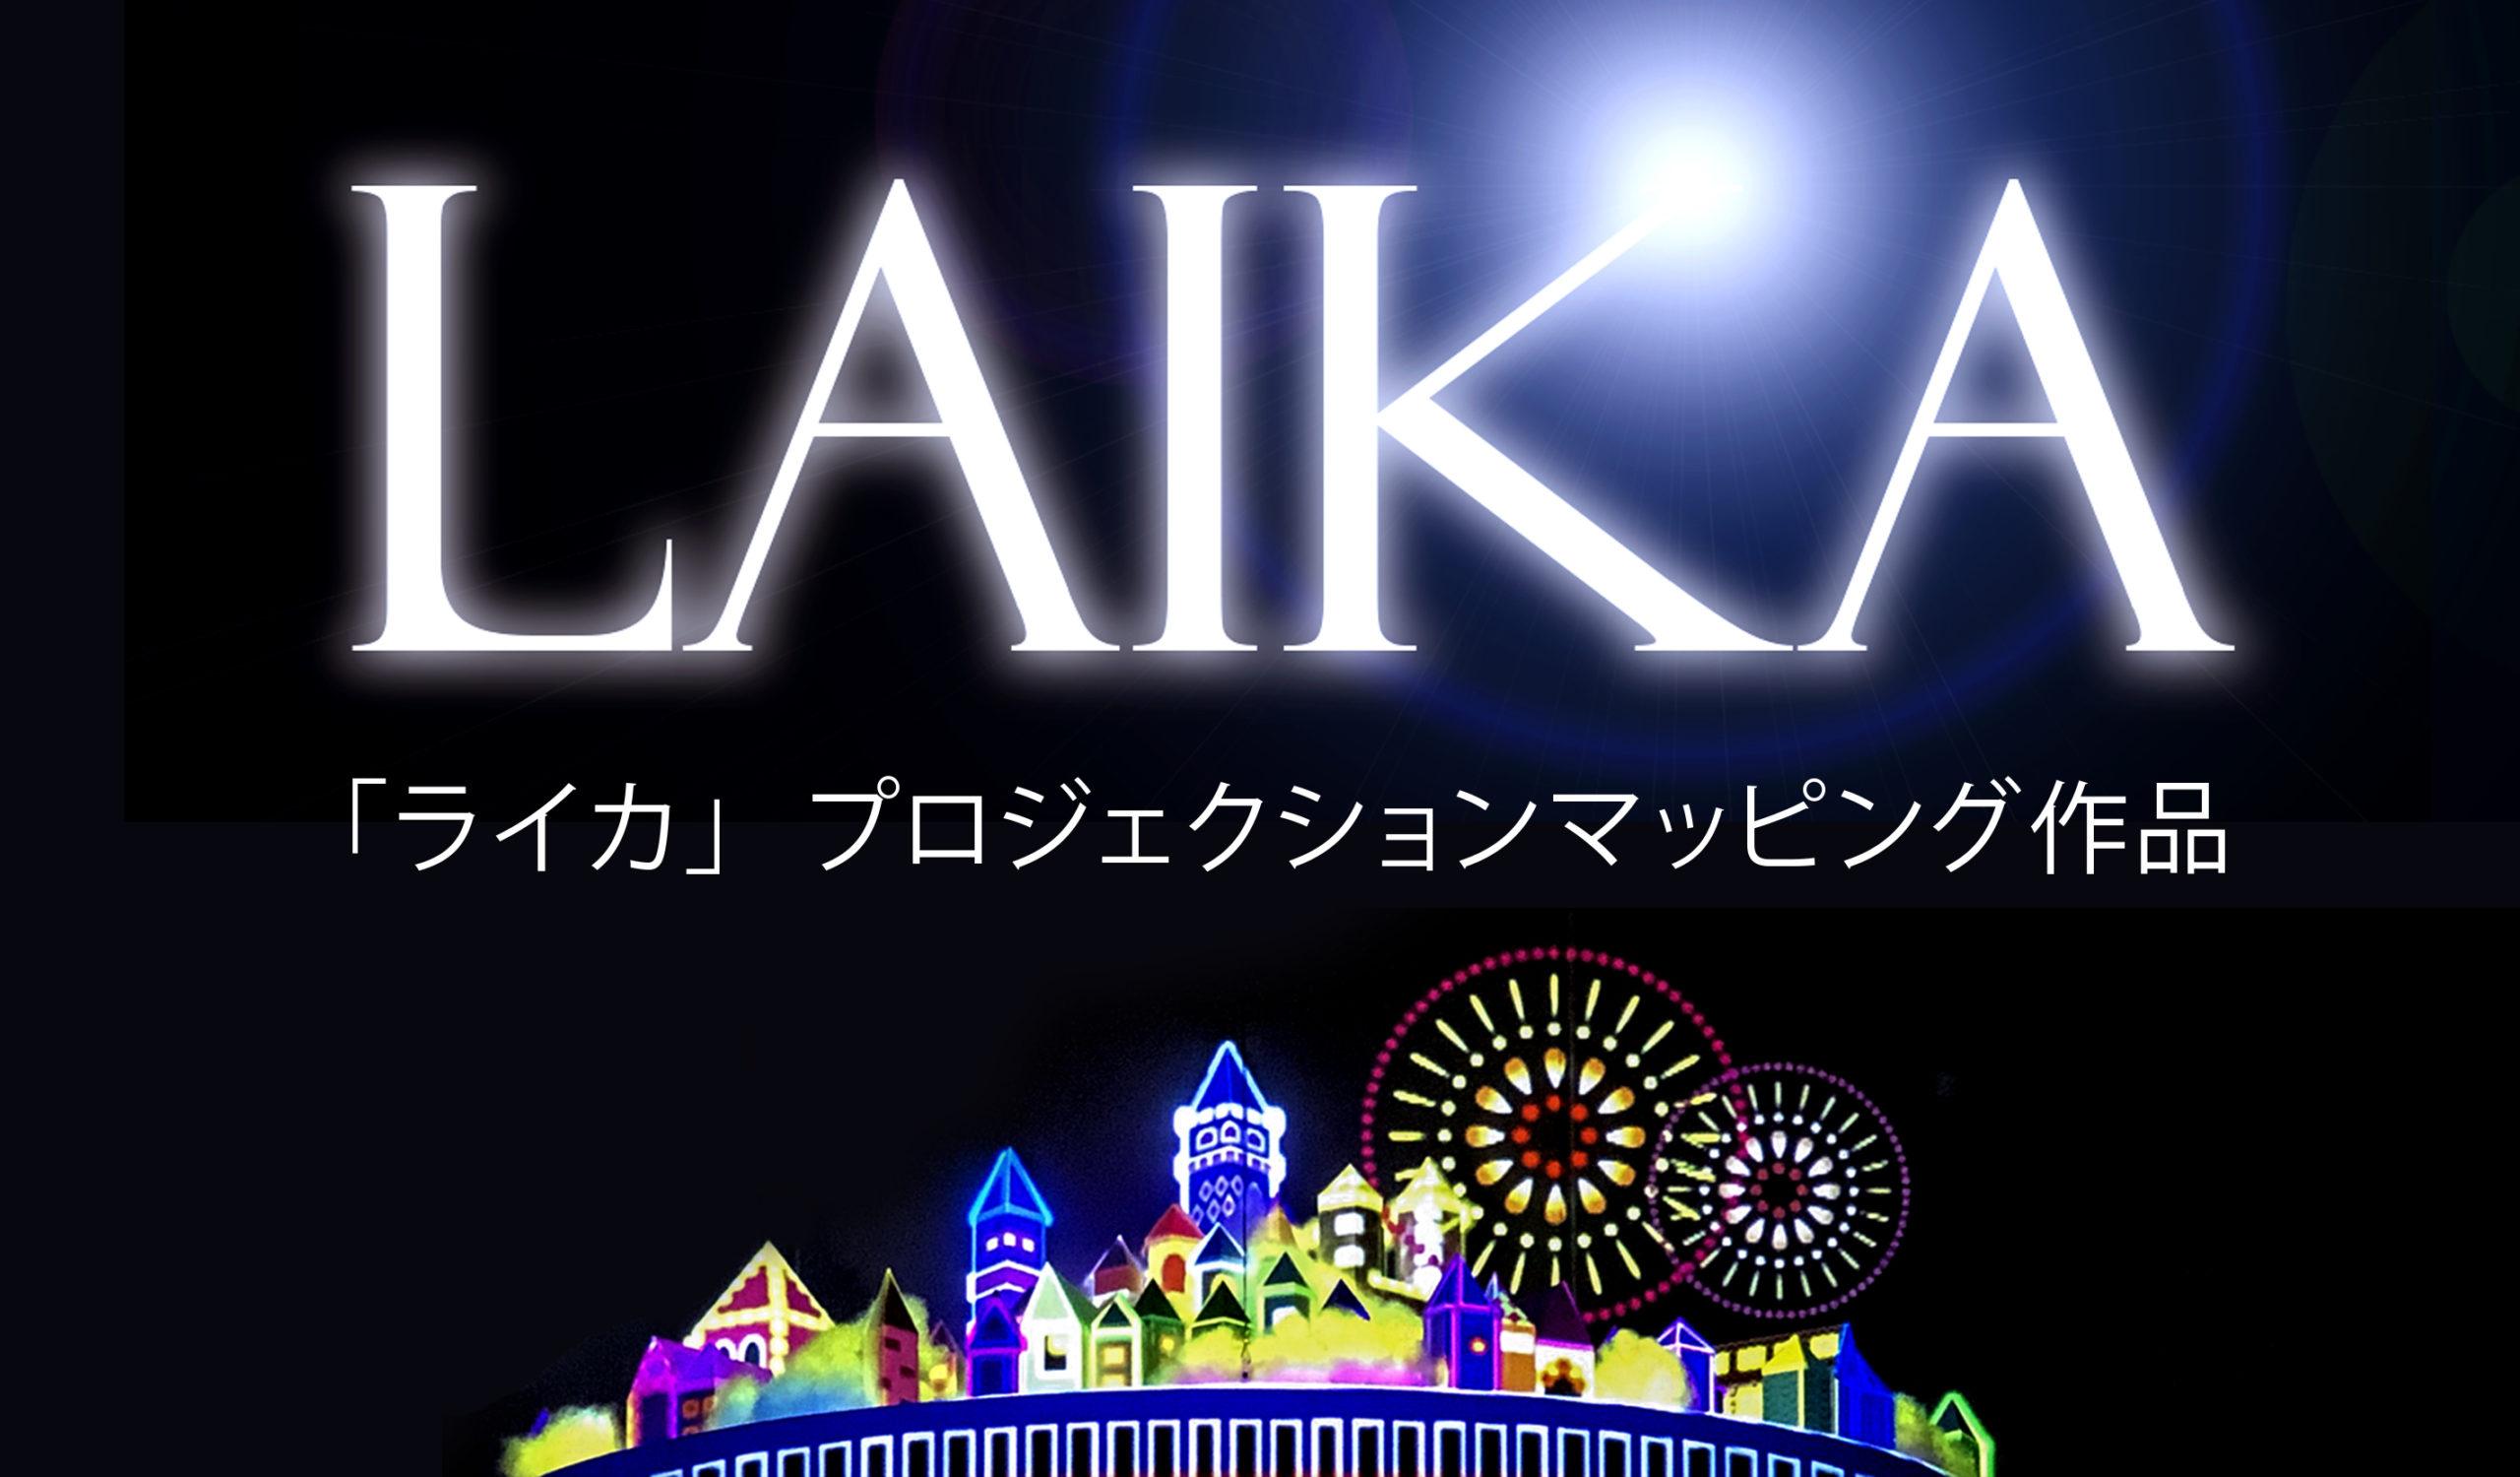 LAIKA プロジェクションマッピング作品